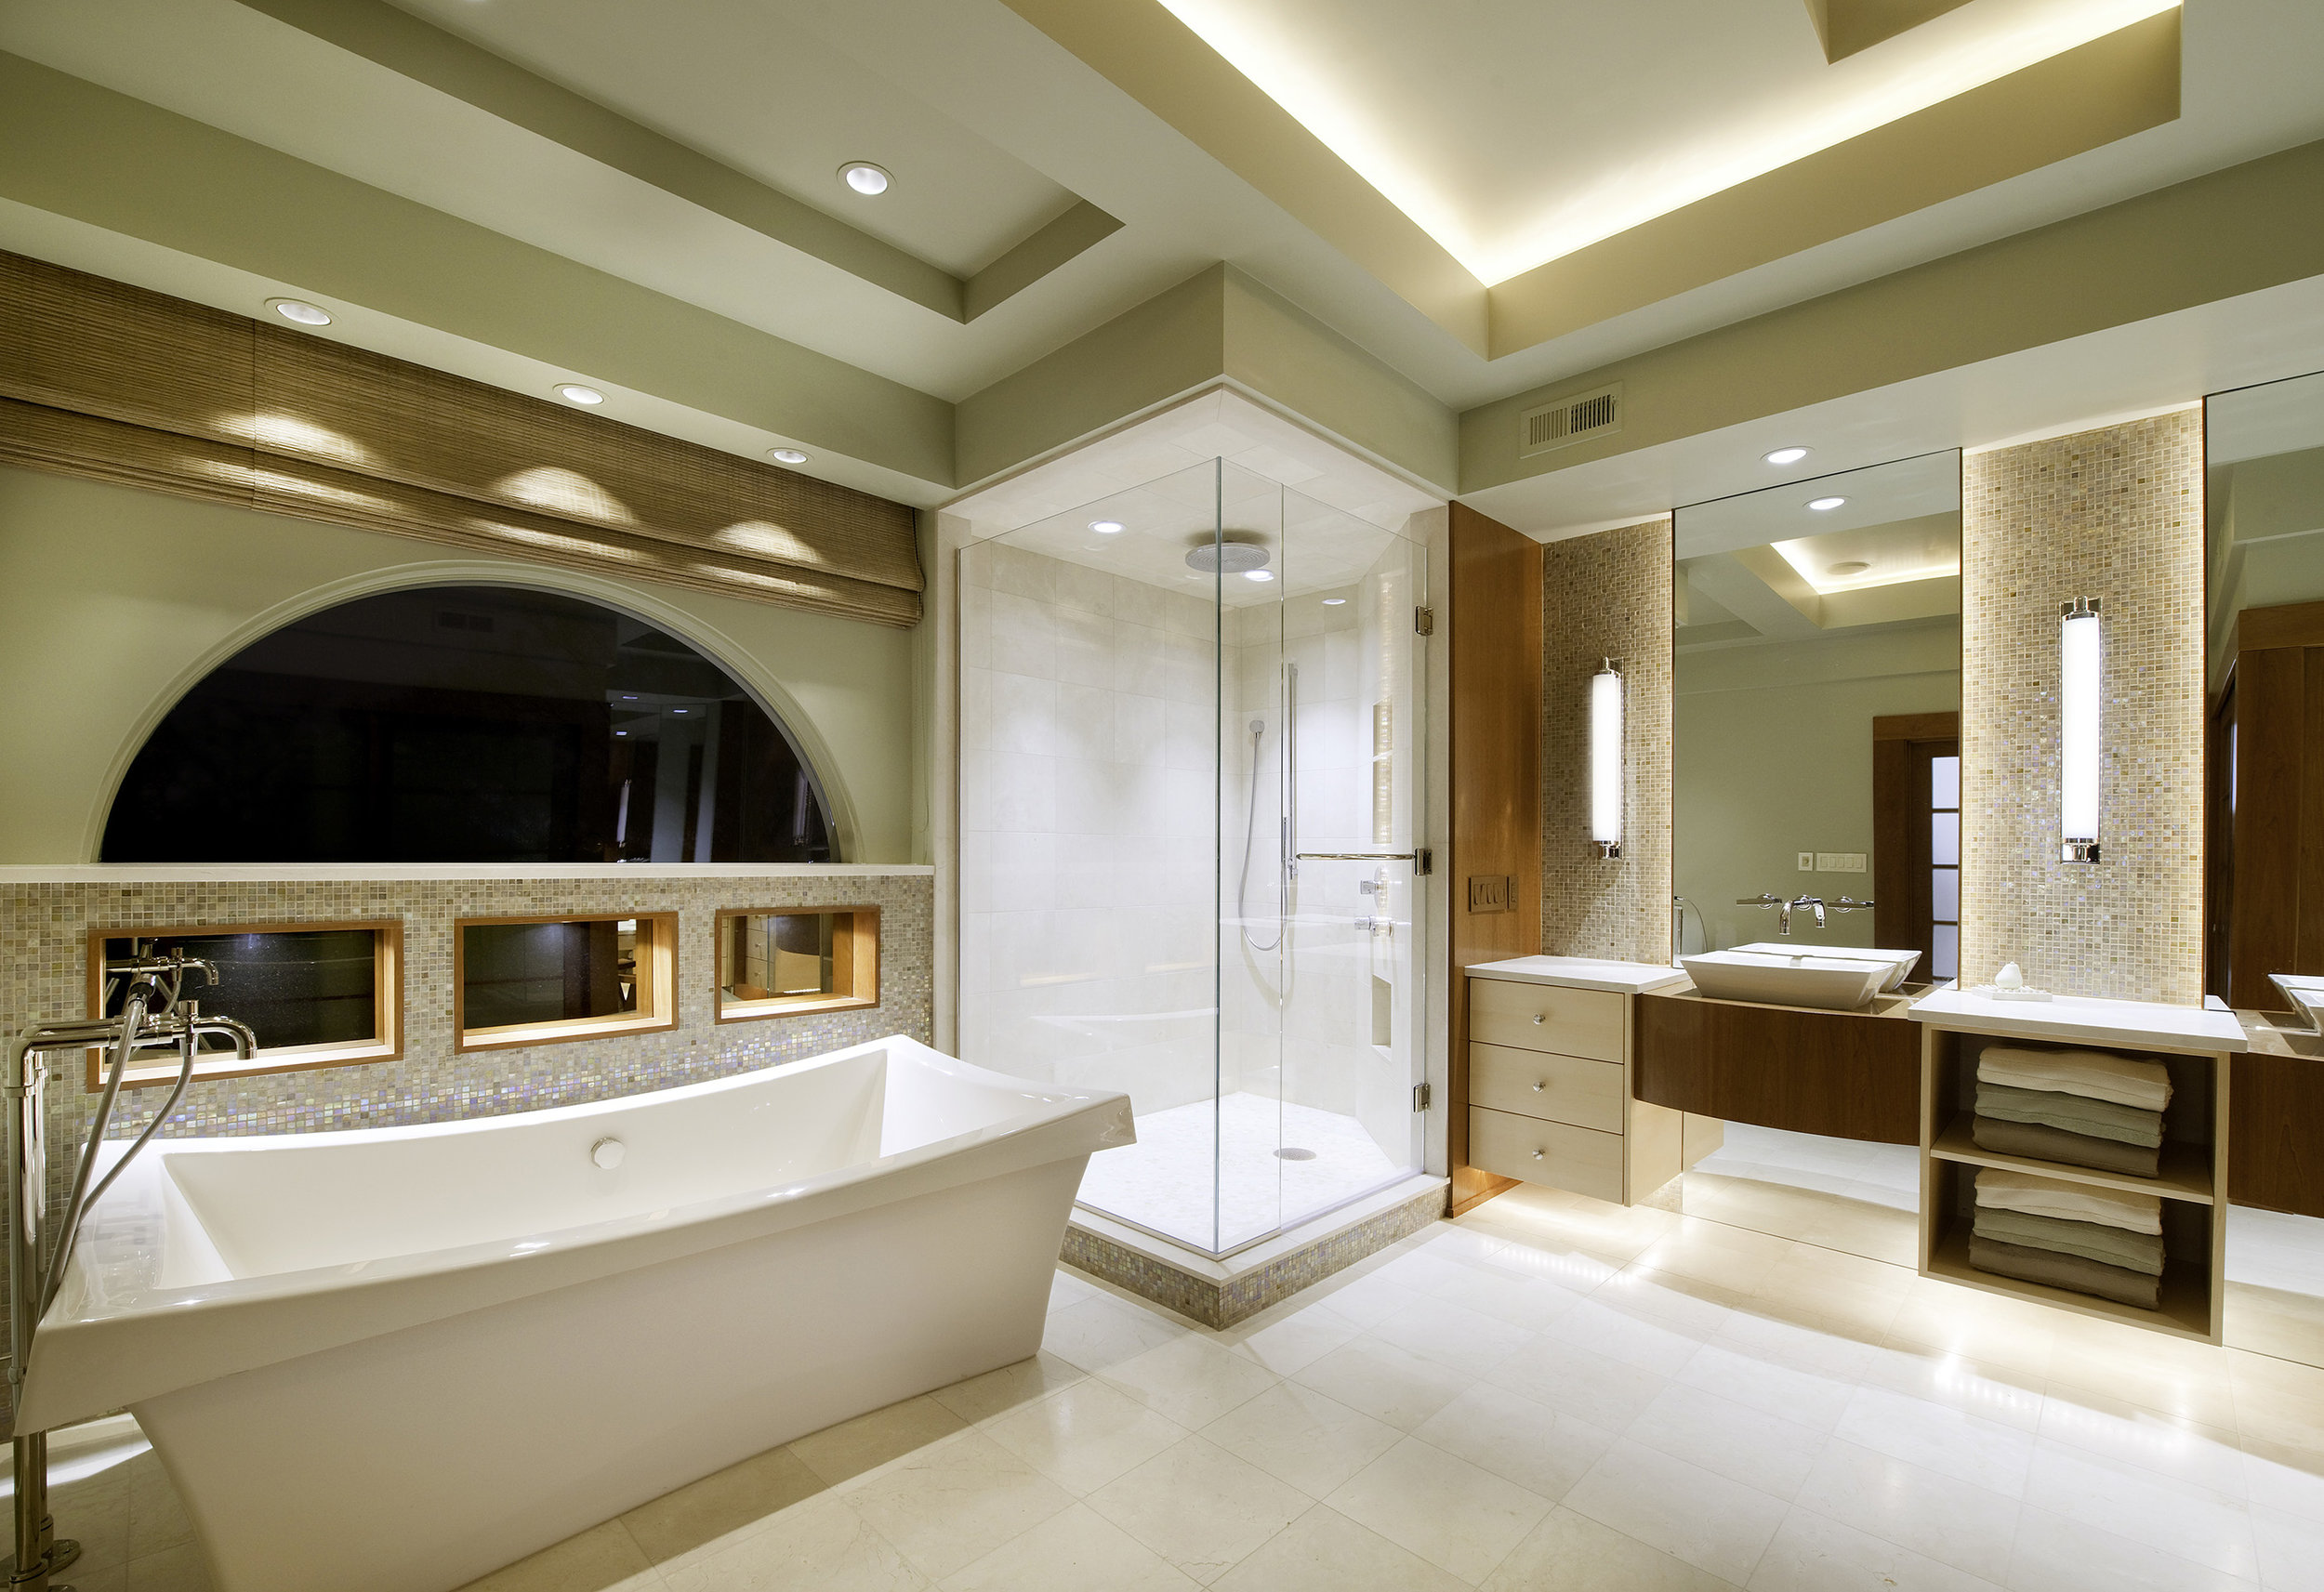 kitchen_bath_concepts_wholehome5_5.jpg